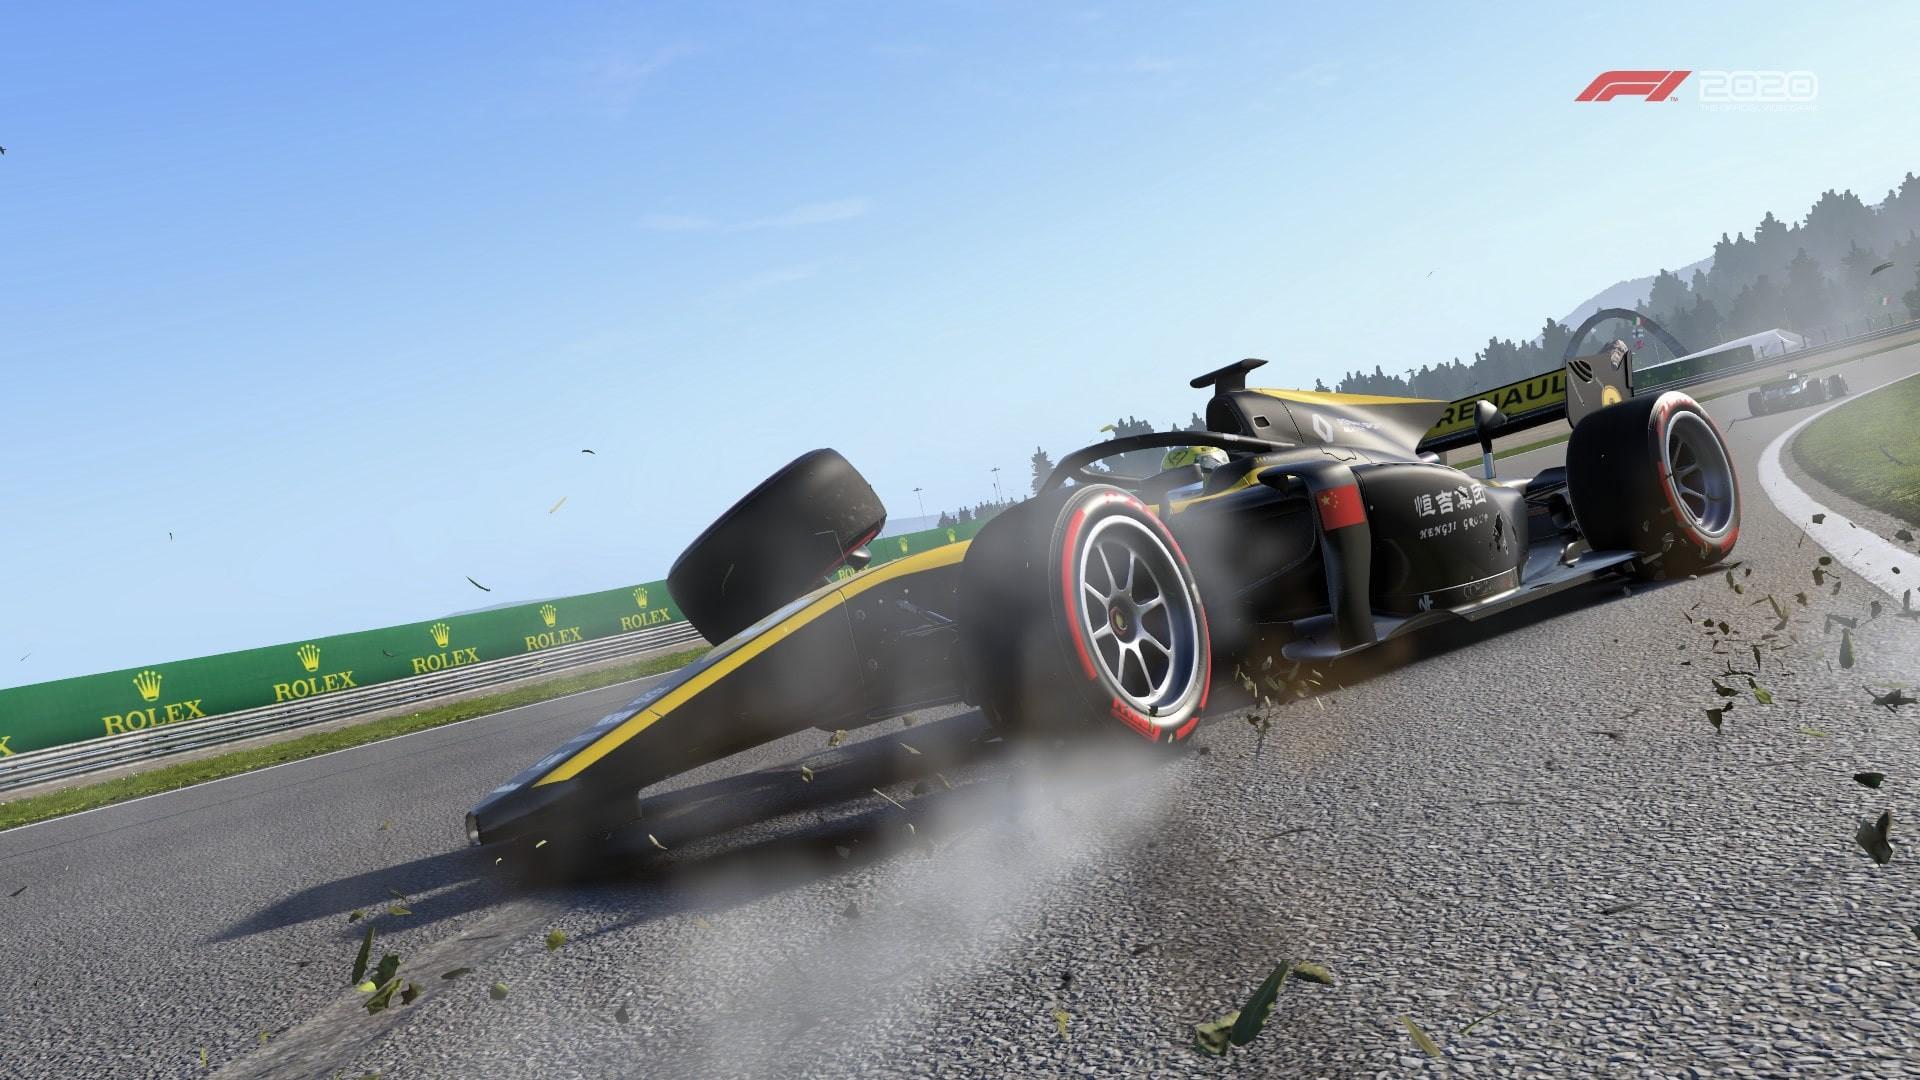 An image of a Uni-Virtuosi Formula 2 in the F1 2020 game having spun out causing terminal damage to the car